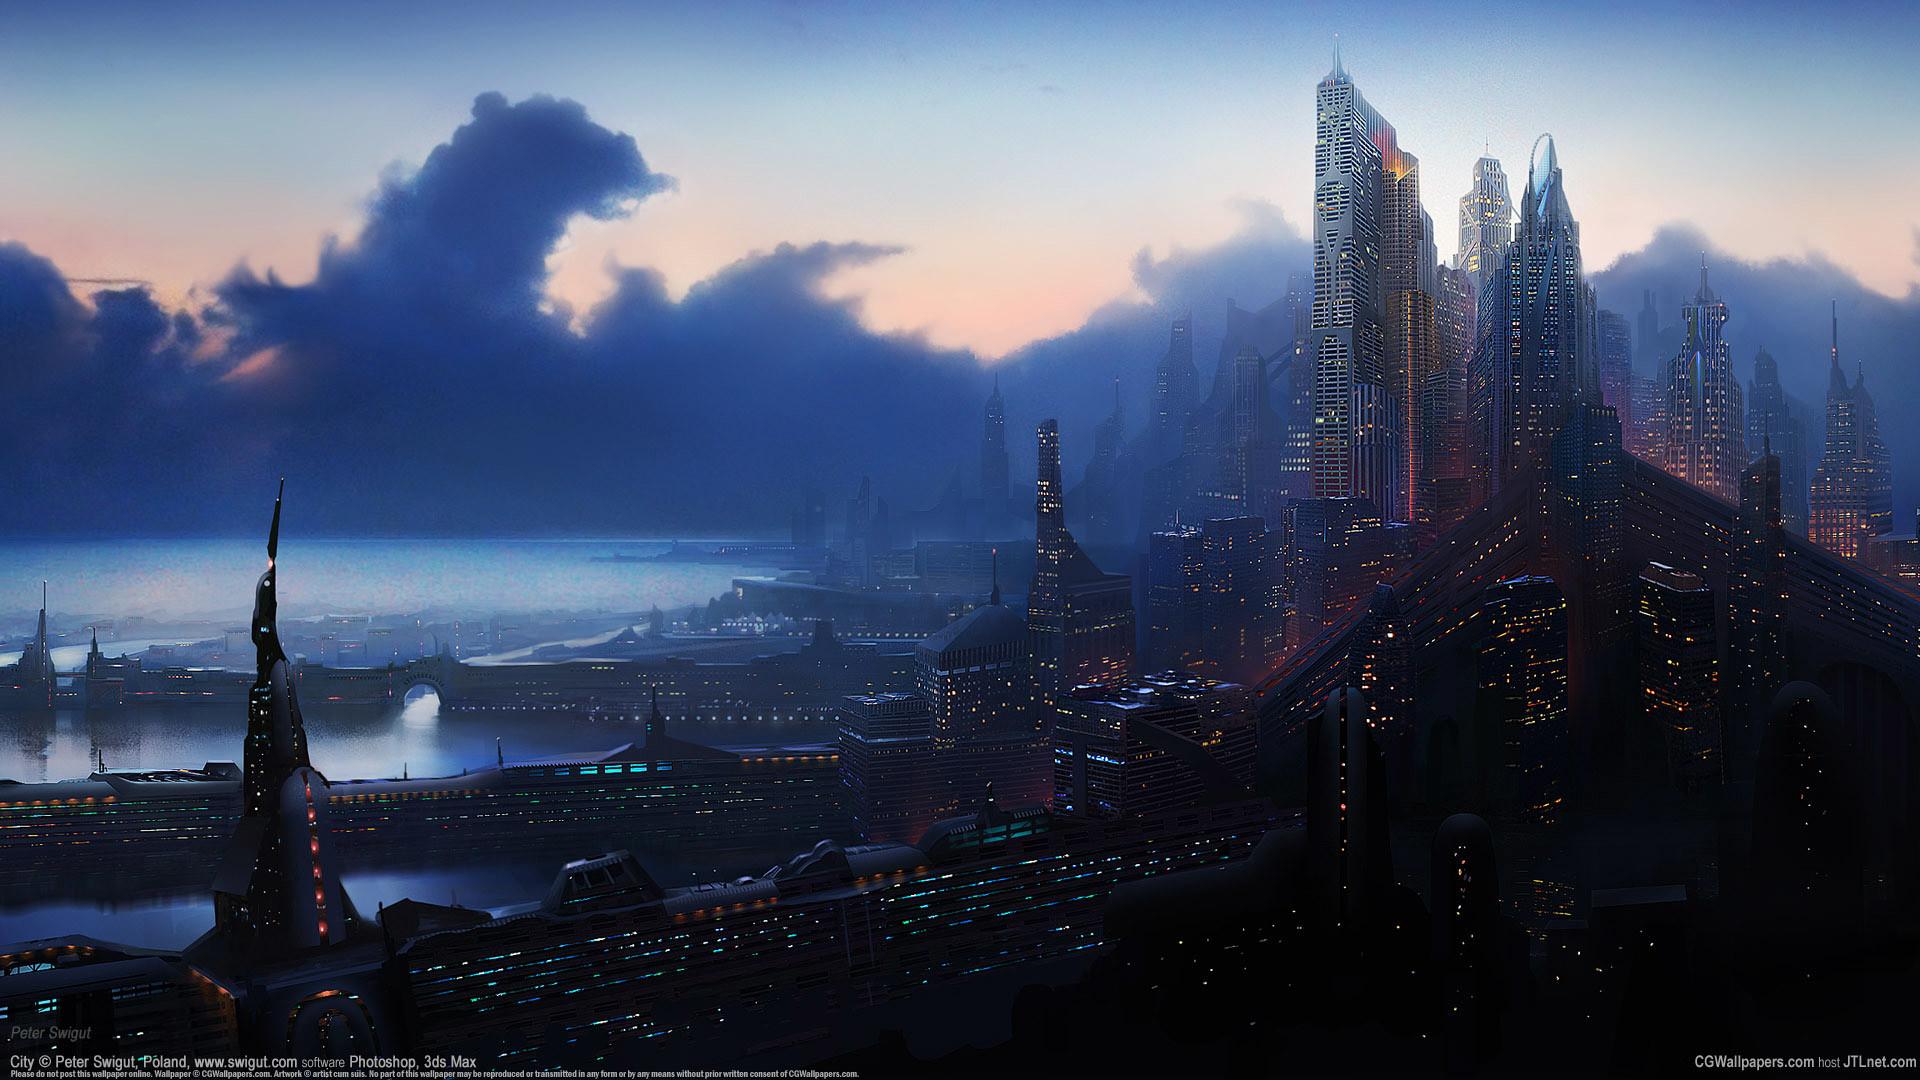 Sci-fi | Full HD Wallpapers, download 1080p desktop backgrounds